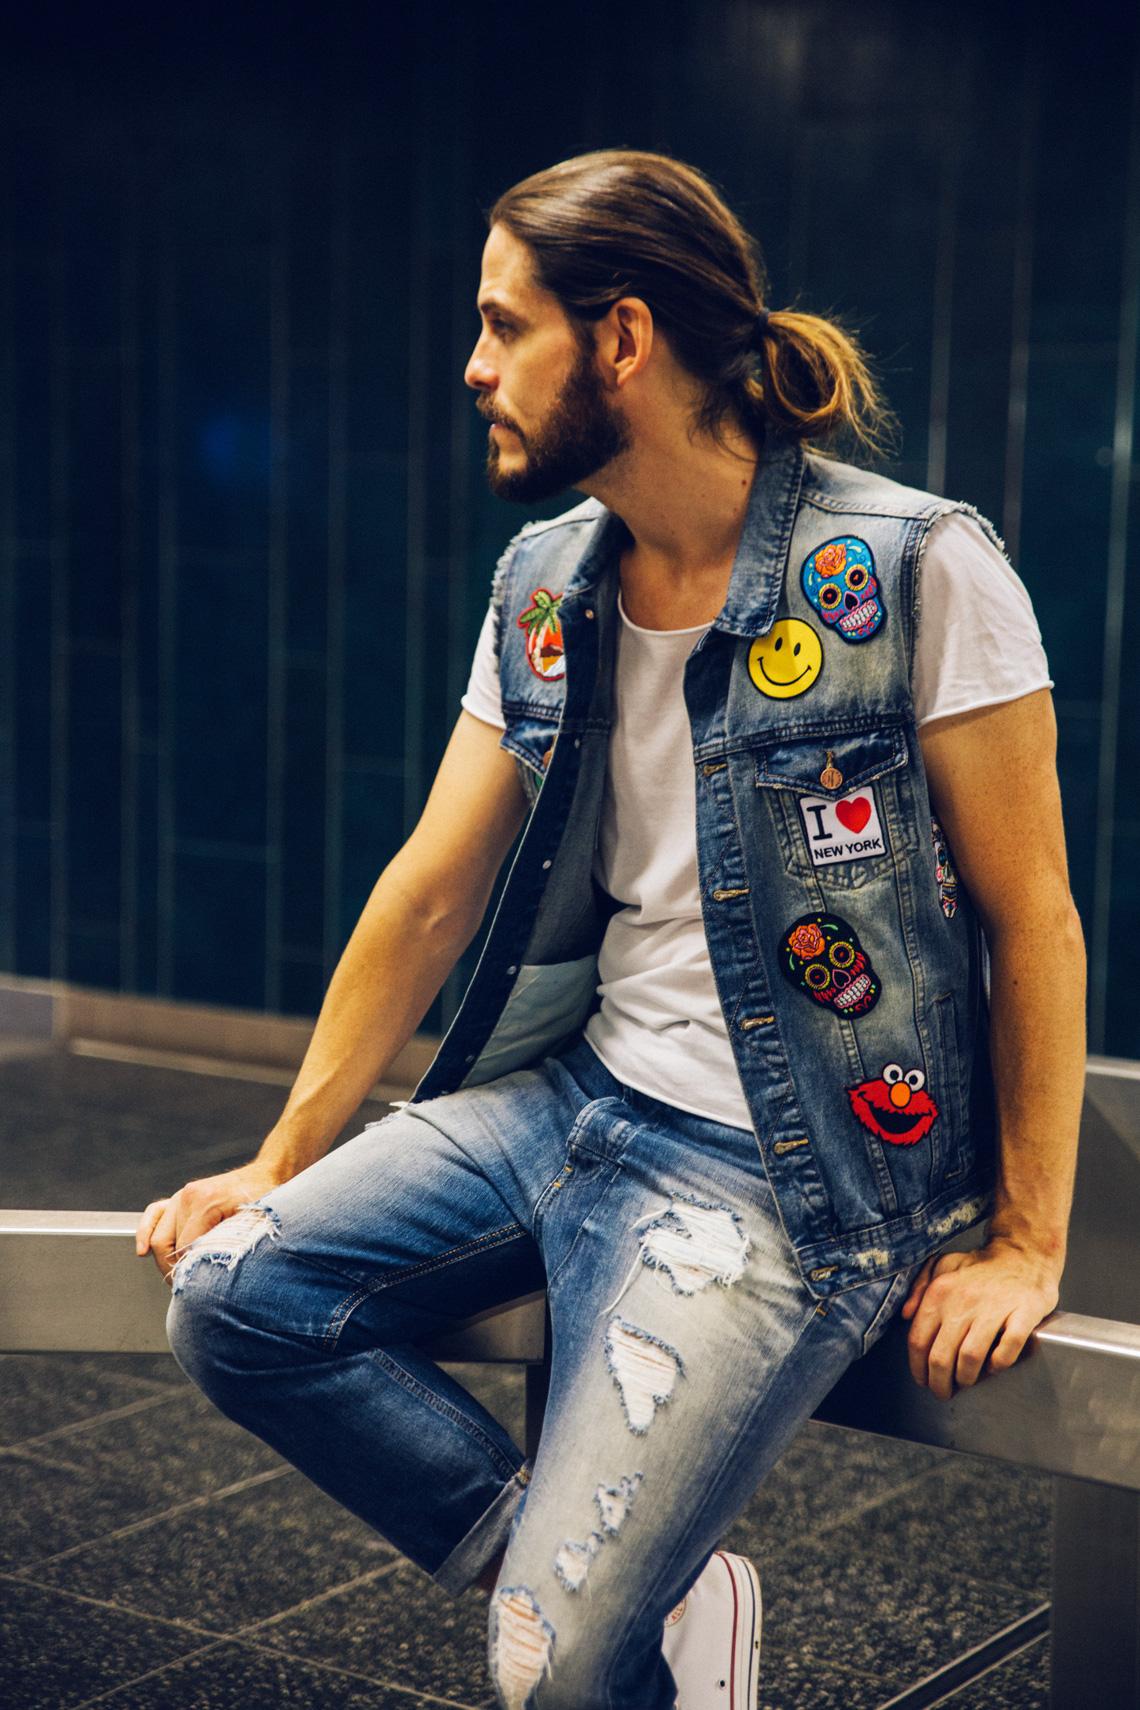 kaisers-neue-kleider-malefashion-blog-maennermode-streetstyle-fashion-trend-patches-denim-jeansweste-chucks